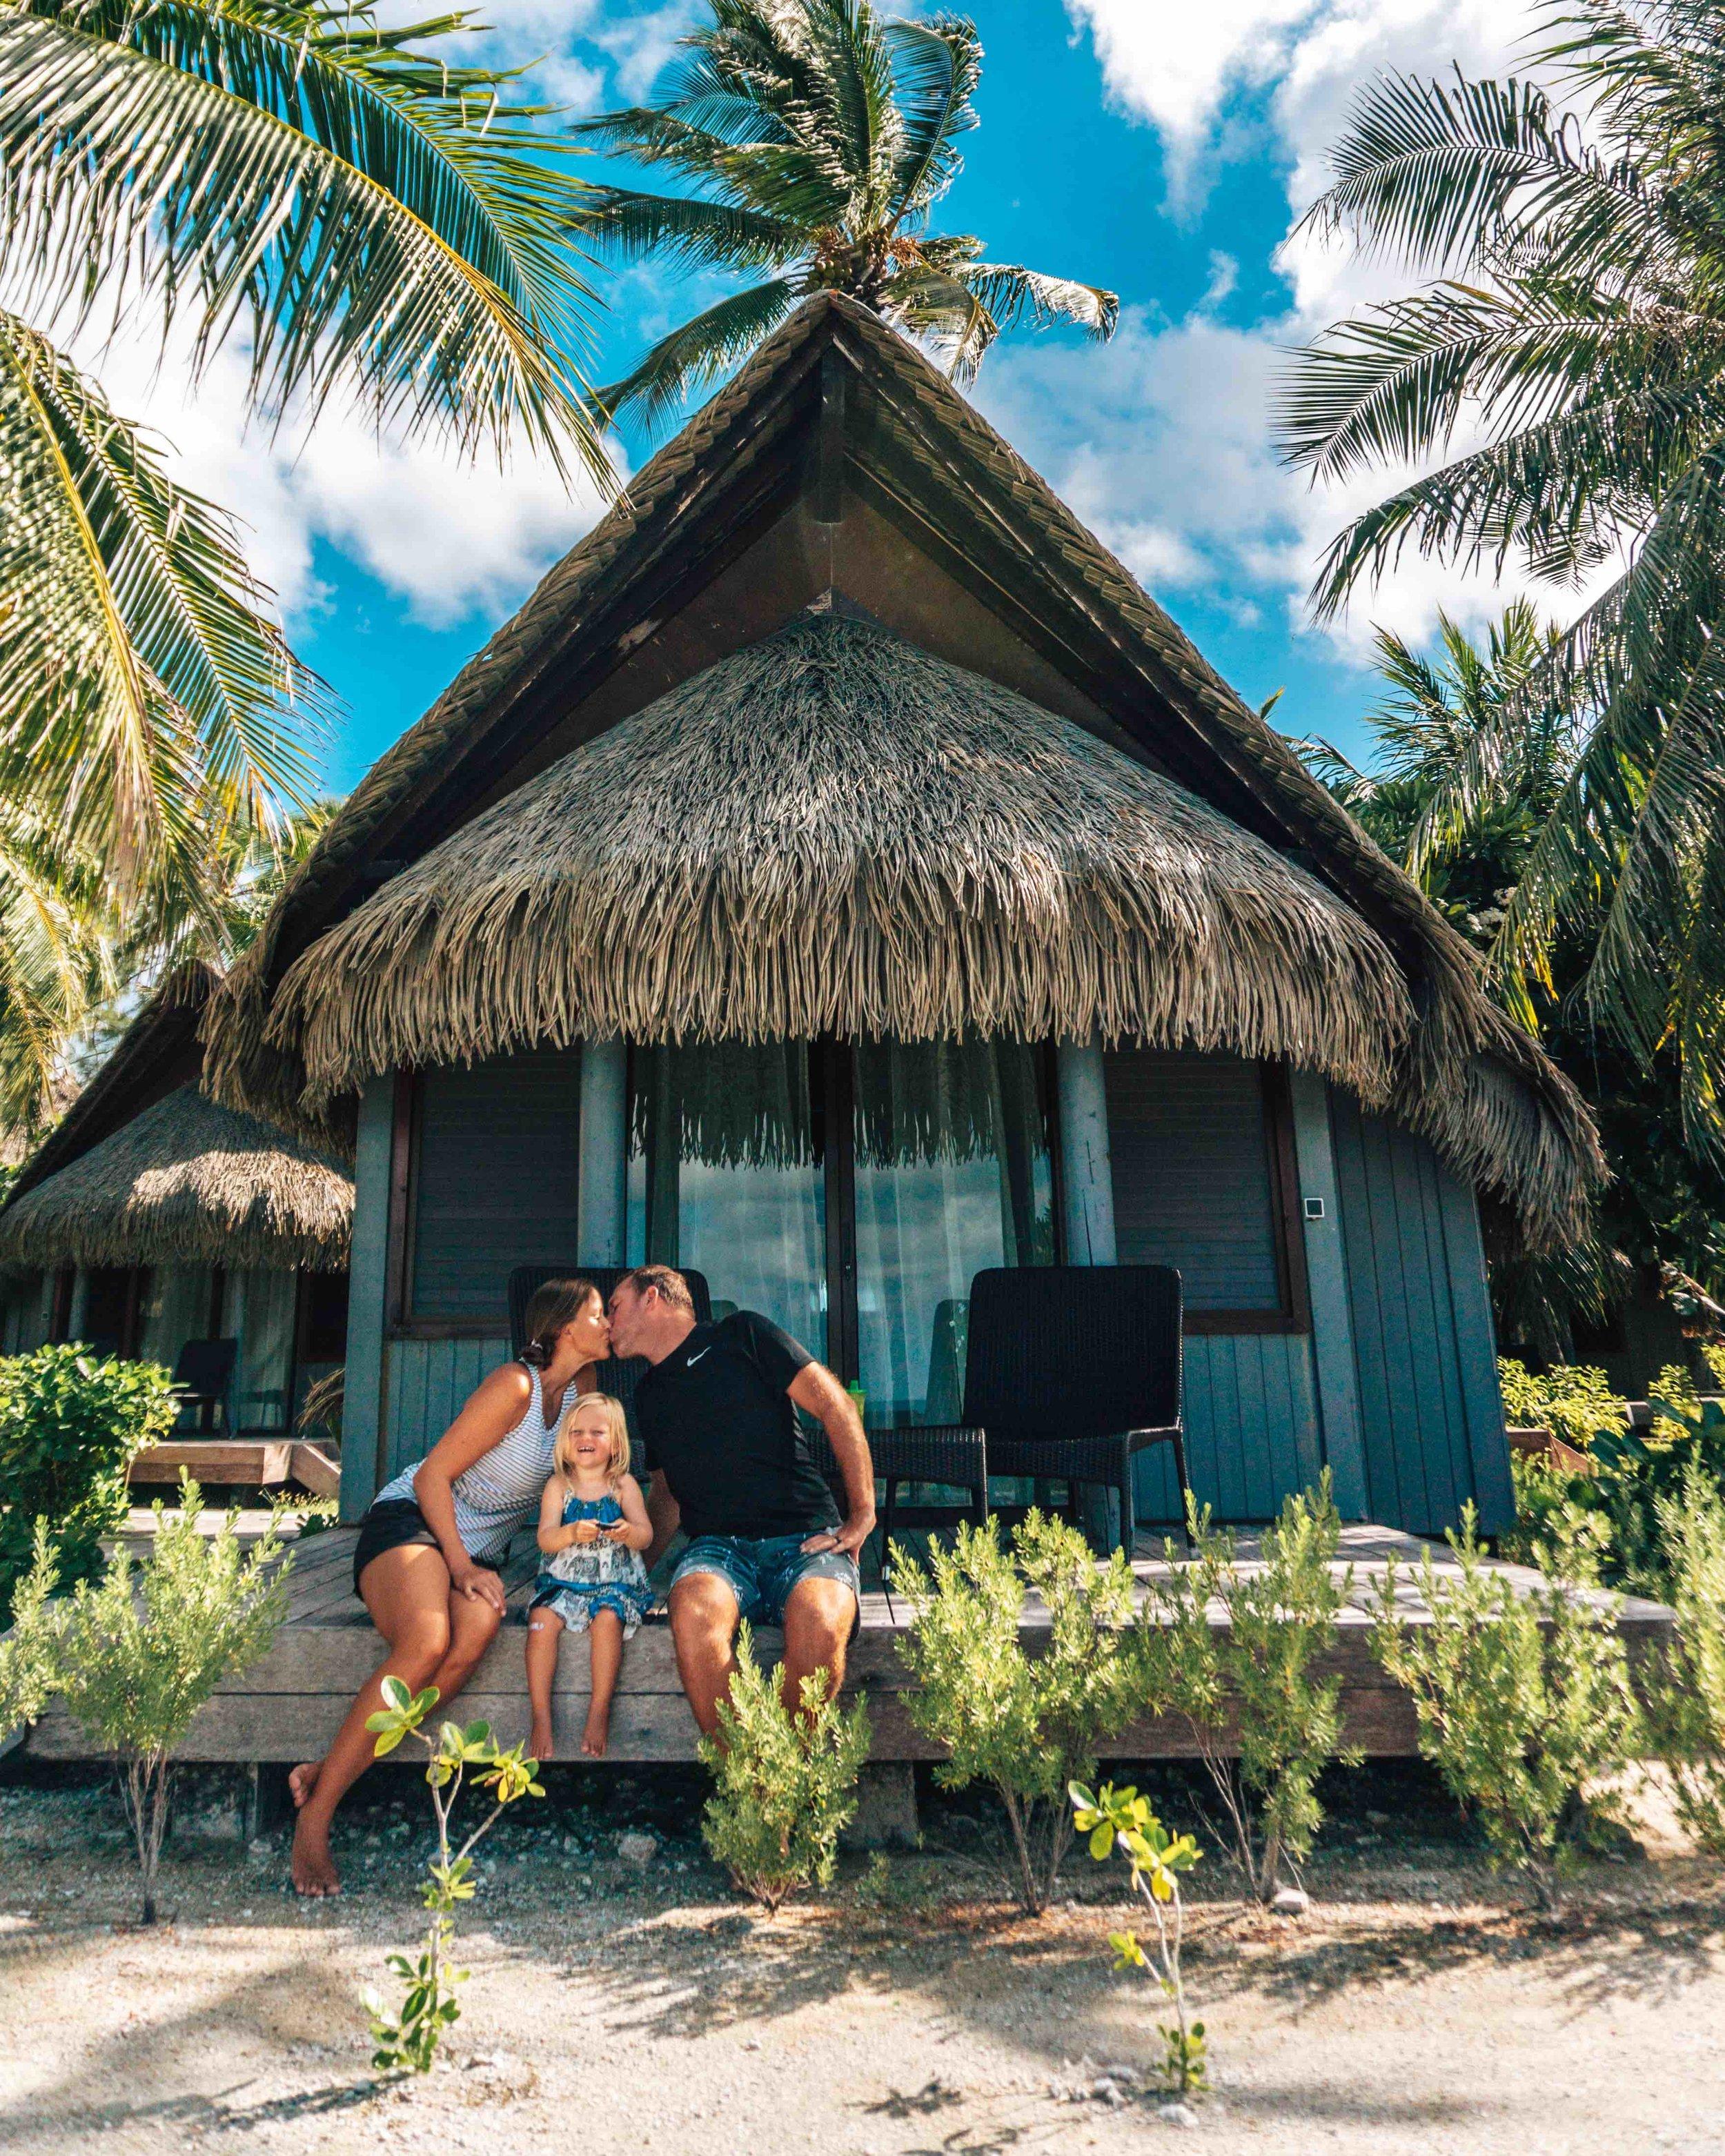 tropical_paradise_beach_island_Rangiroa_french polynesia_south pacific_4_Maitai.jpg